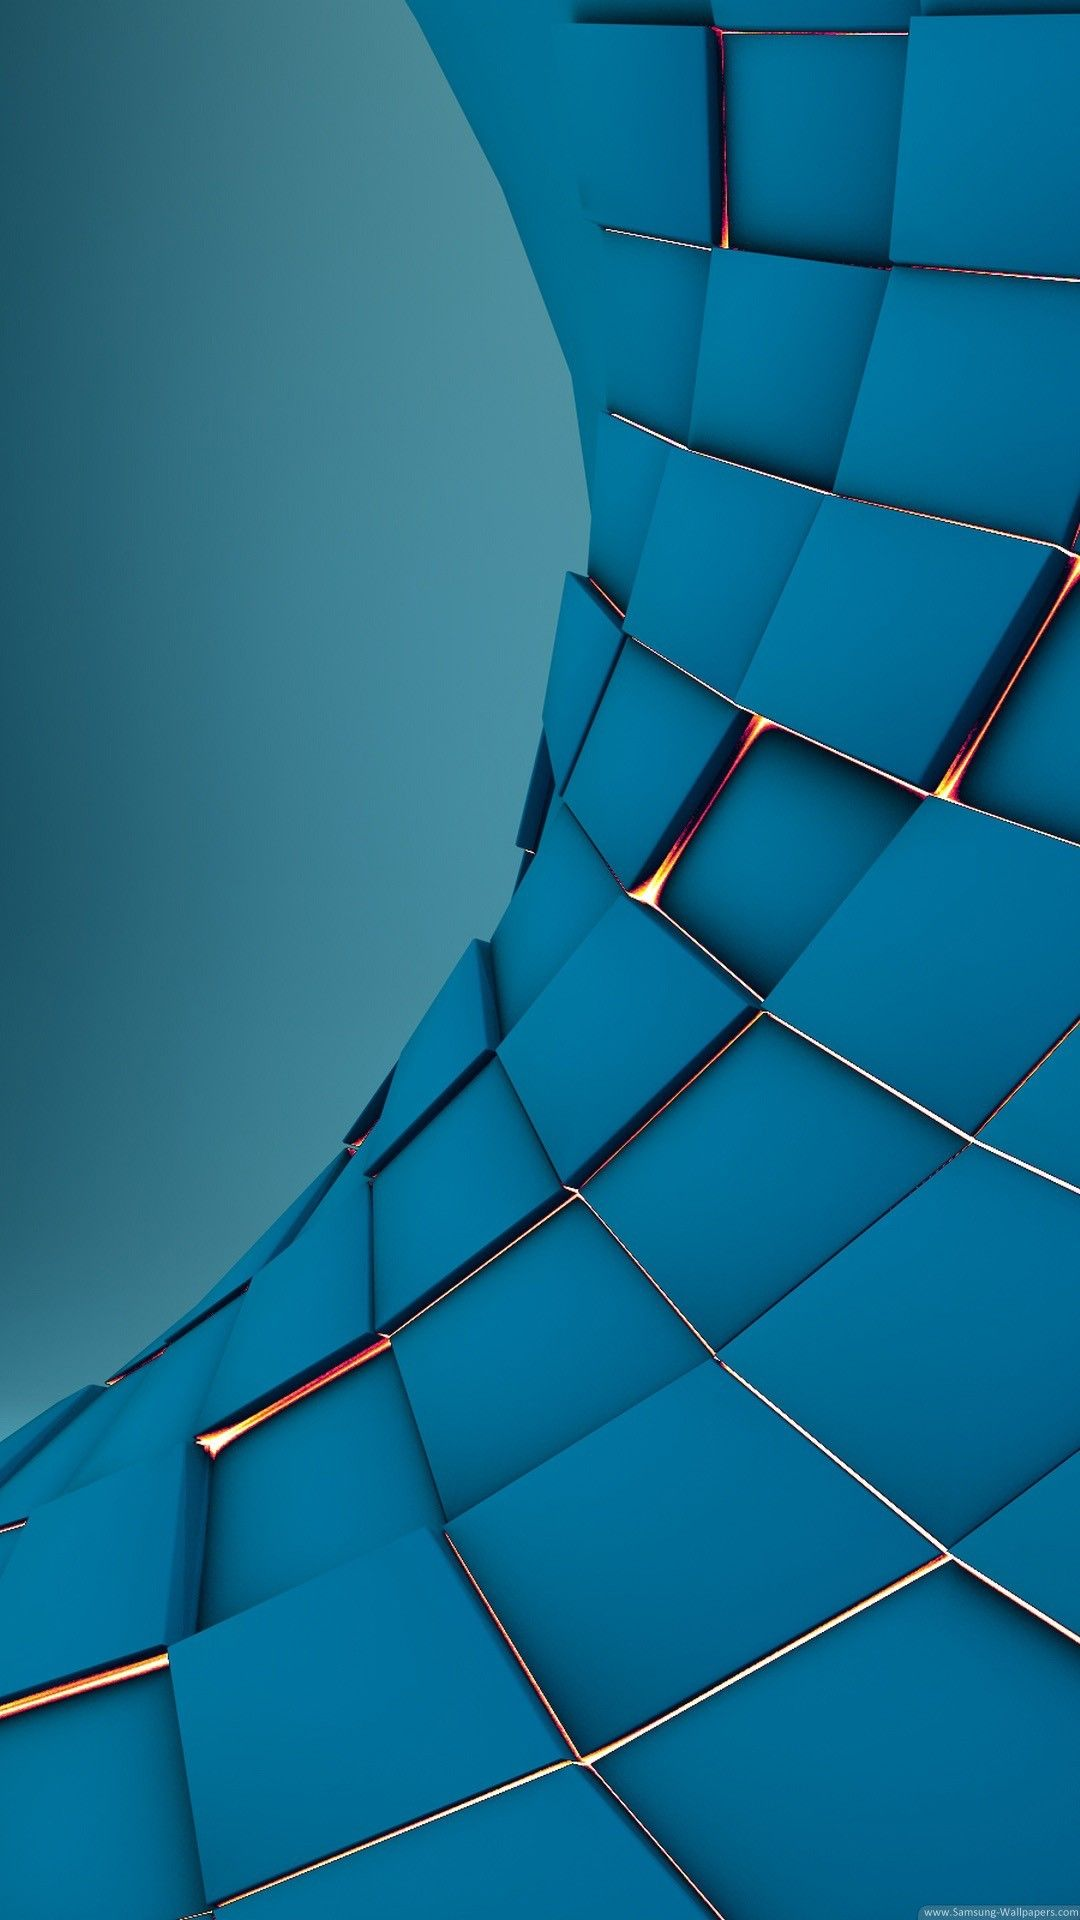 Custom iPhone 5S Dynamic Wallpapers